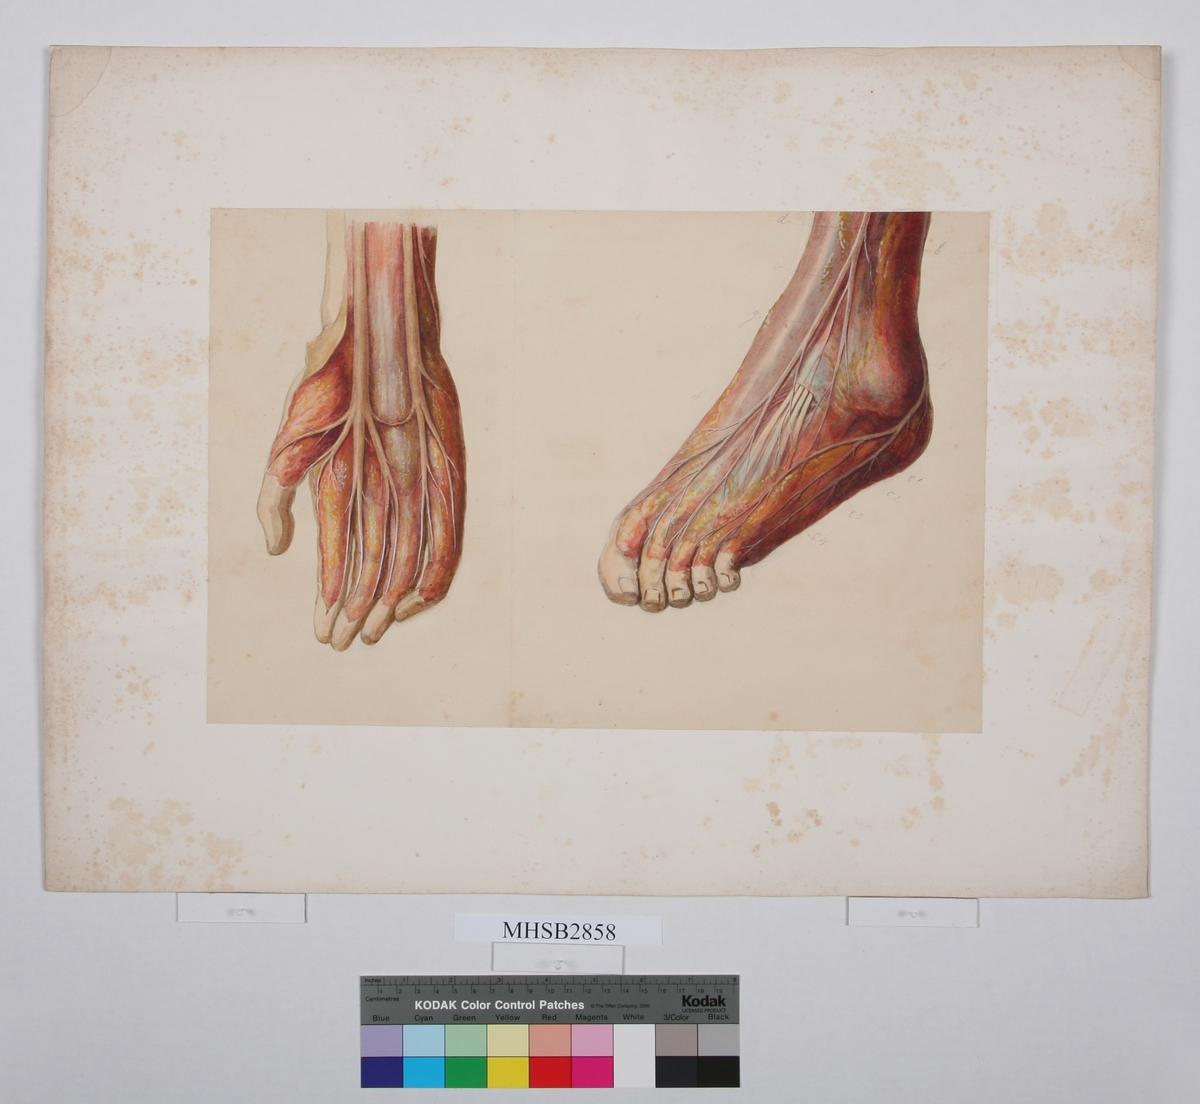 Hånd og fot Viser sener og blodårer Bokstaver/tall påført de ulike blodårene med blyant